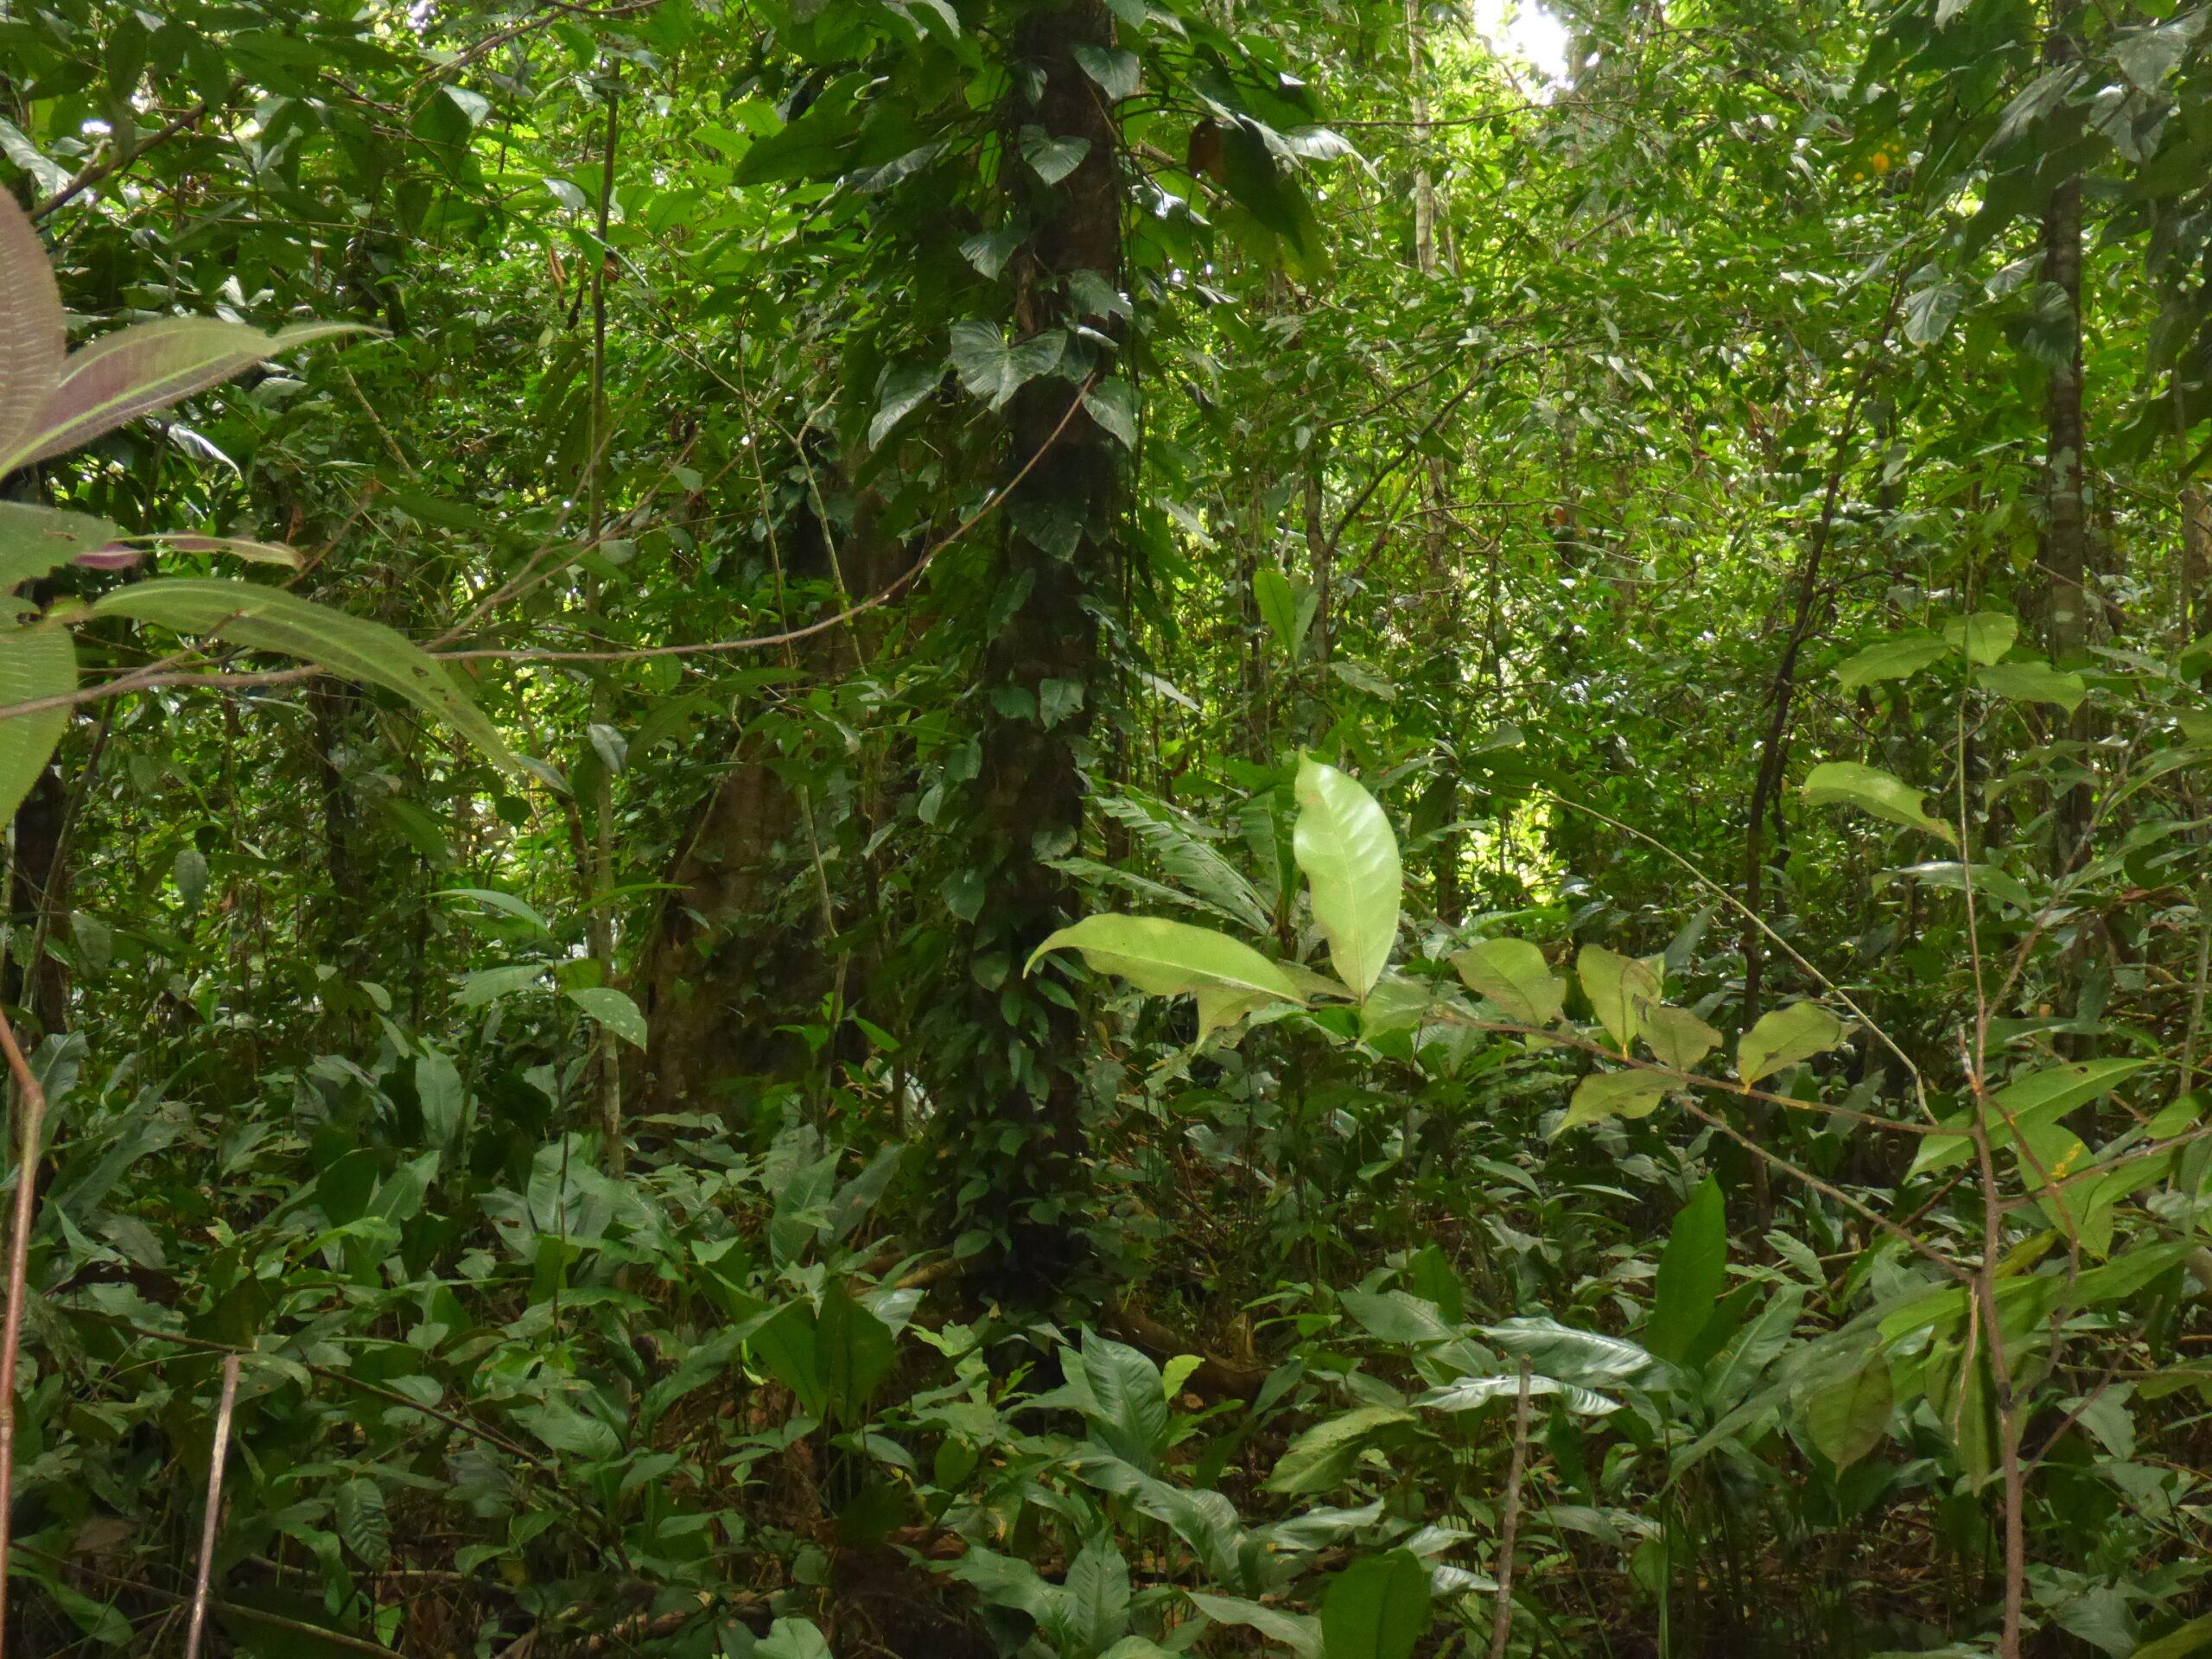 Biotope of Oophaga pumilio on Isla Cristobal, Bocas del Toro, Panama - by E. Van Heygen.